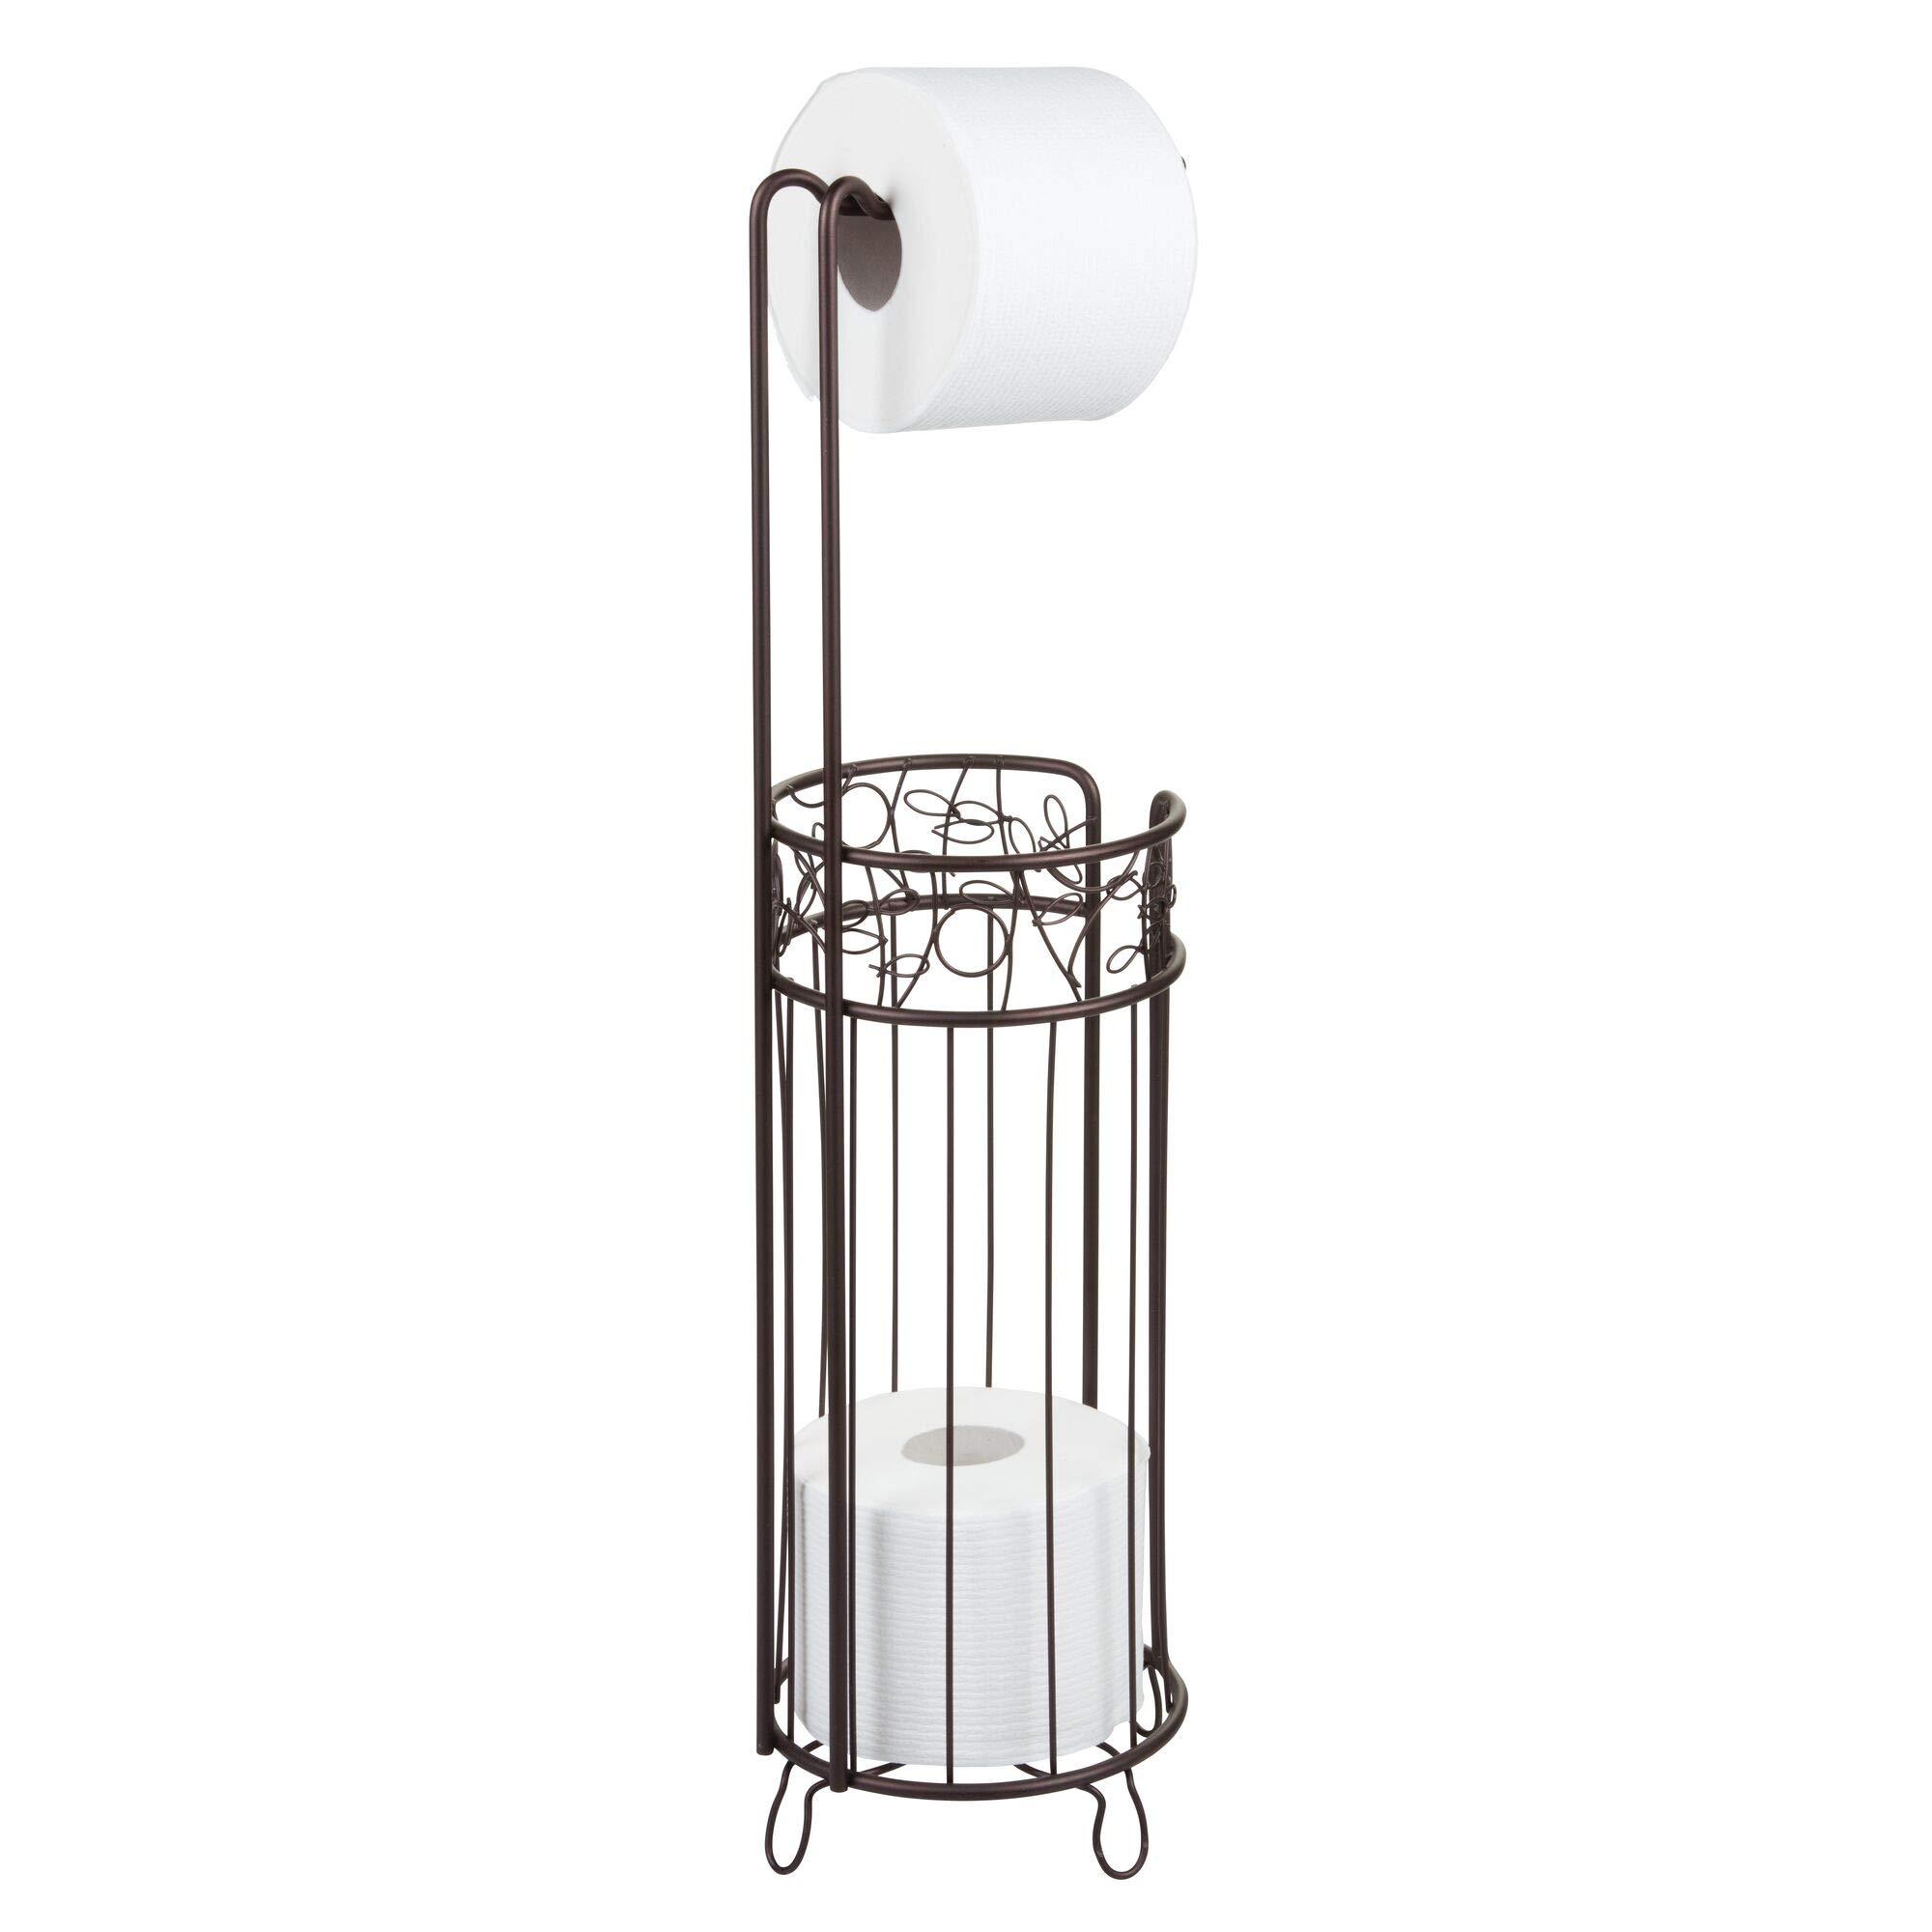 iDesign Twigz Steel Free-Standing Toilet Paper Storage Dispenser – 7″ x 7″ x 25″, Bronze